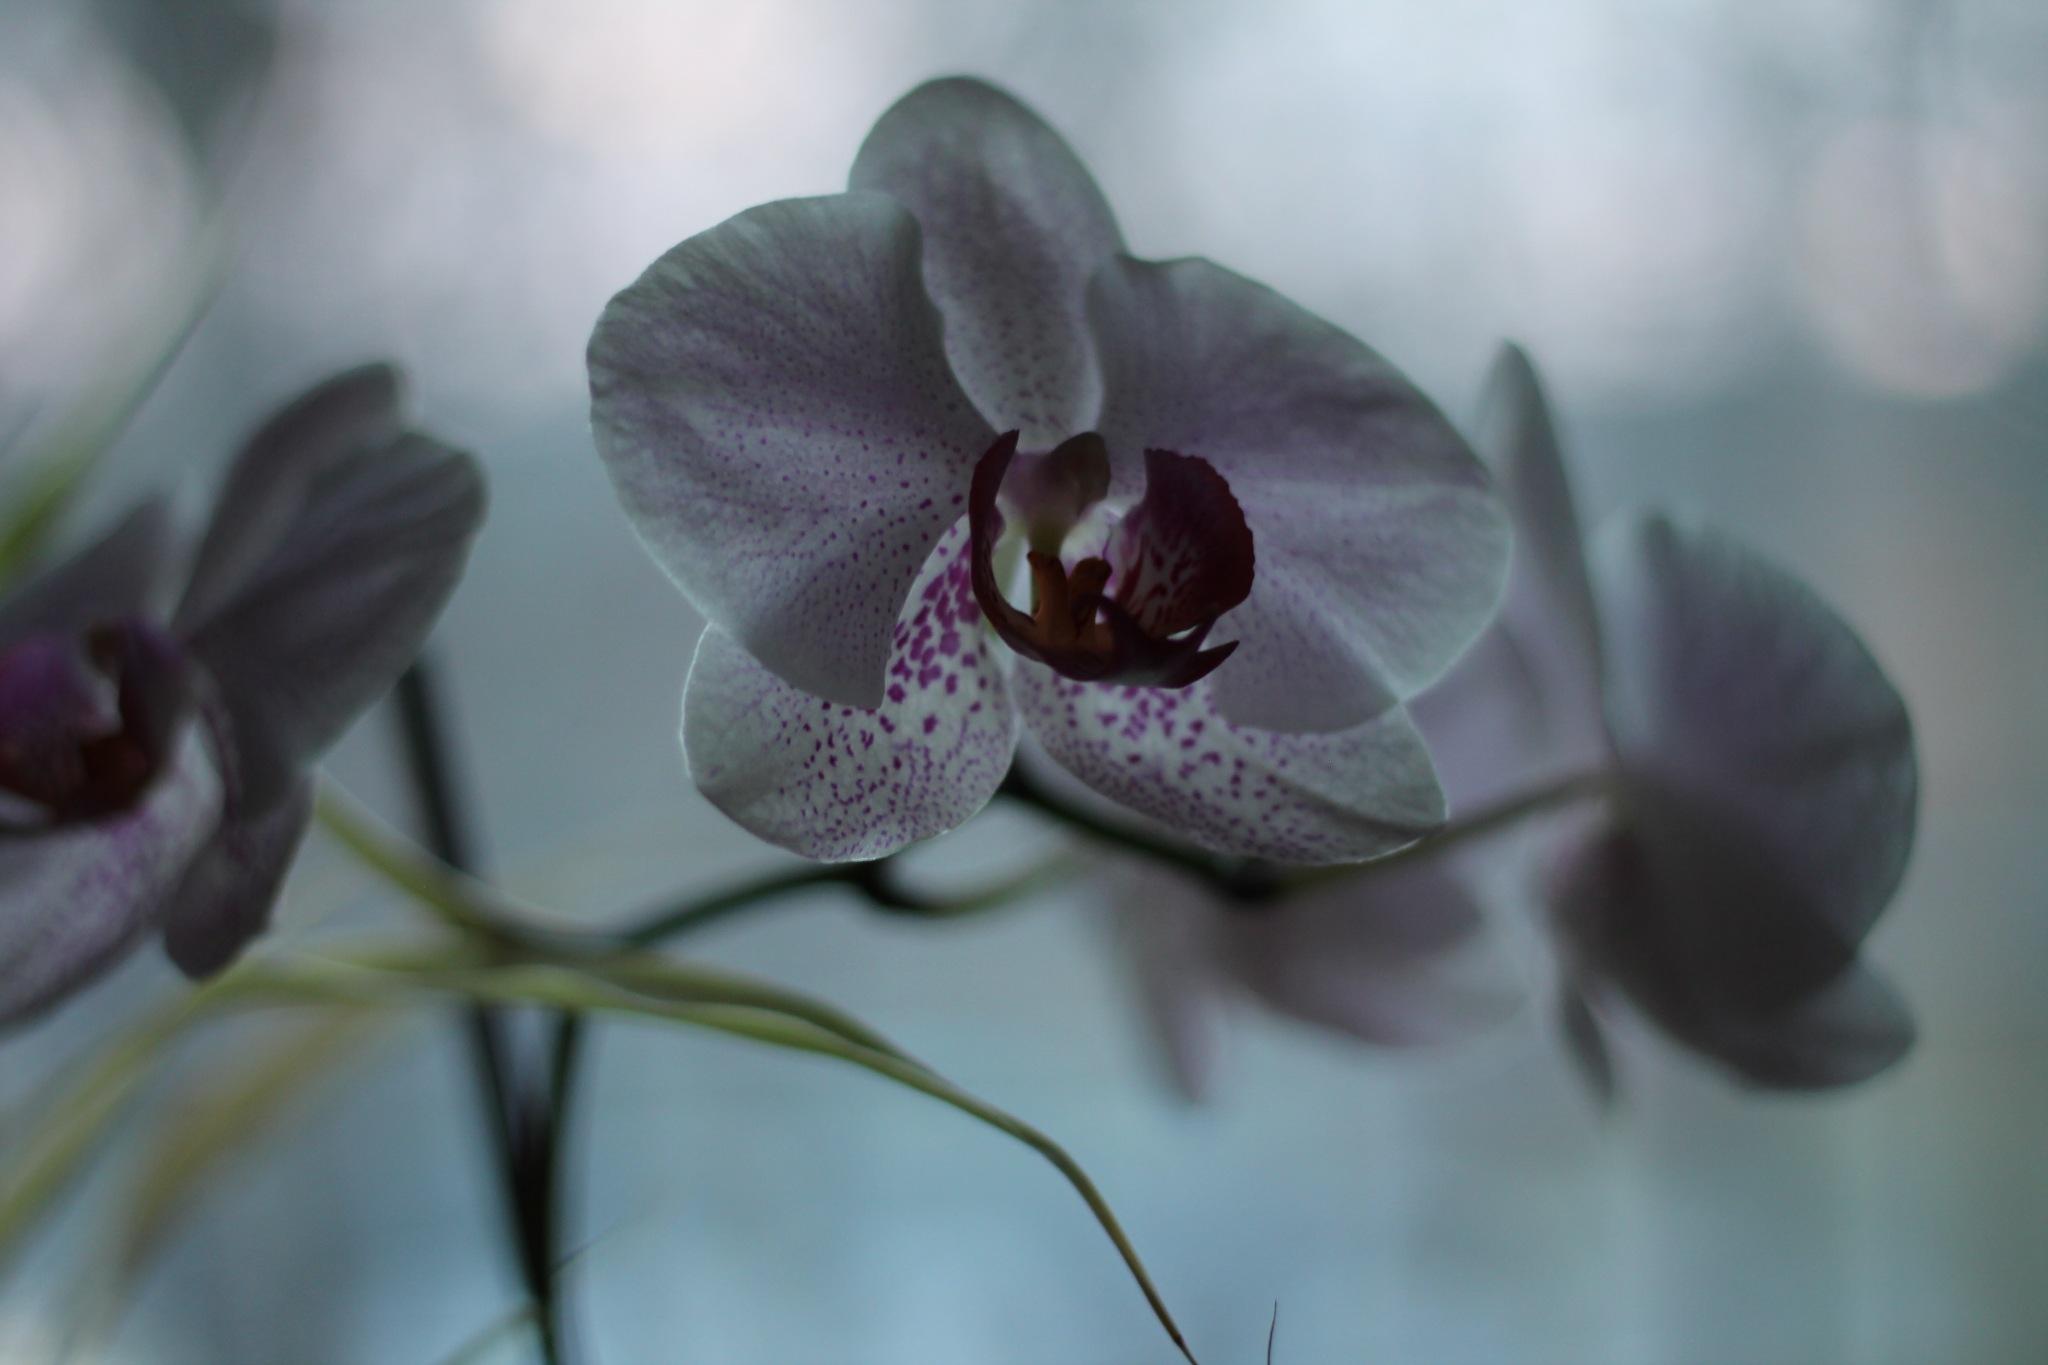 orchidea IV by Gaudreau Sylvain